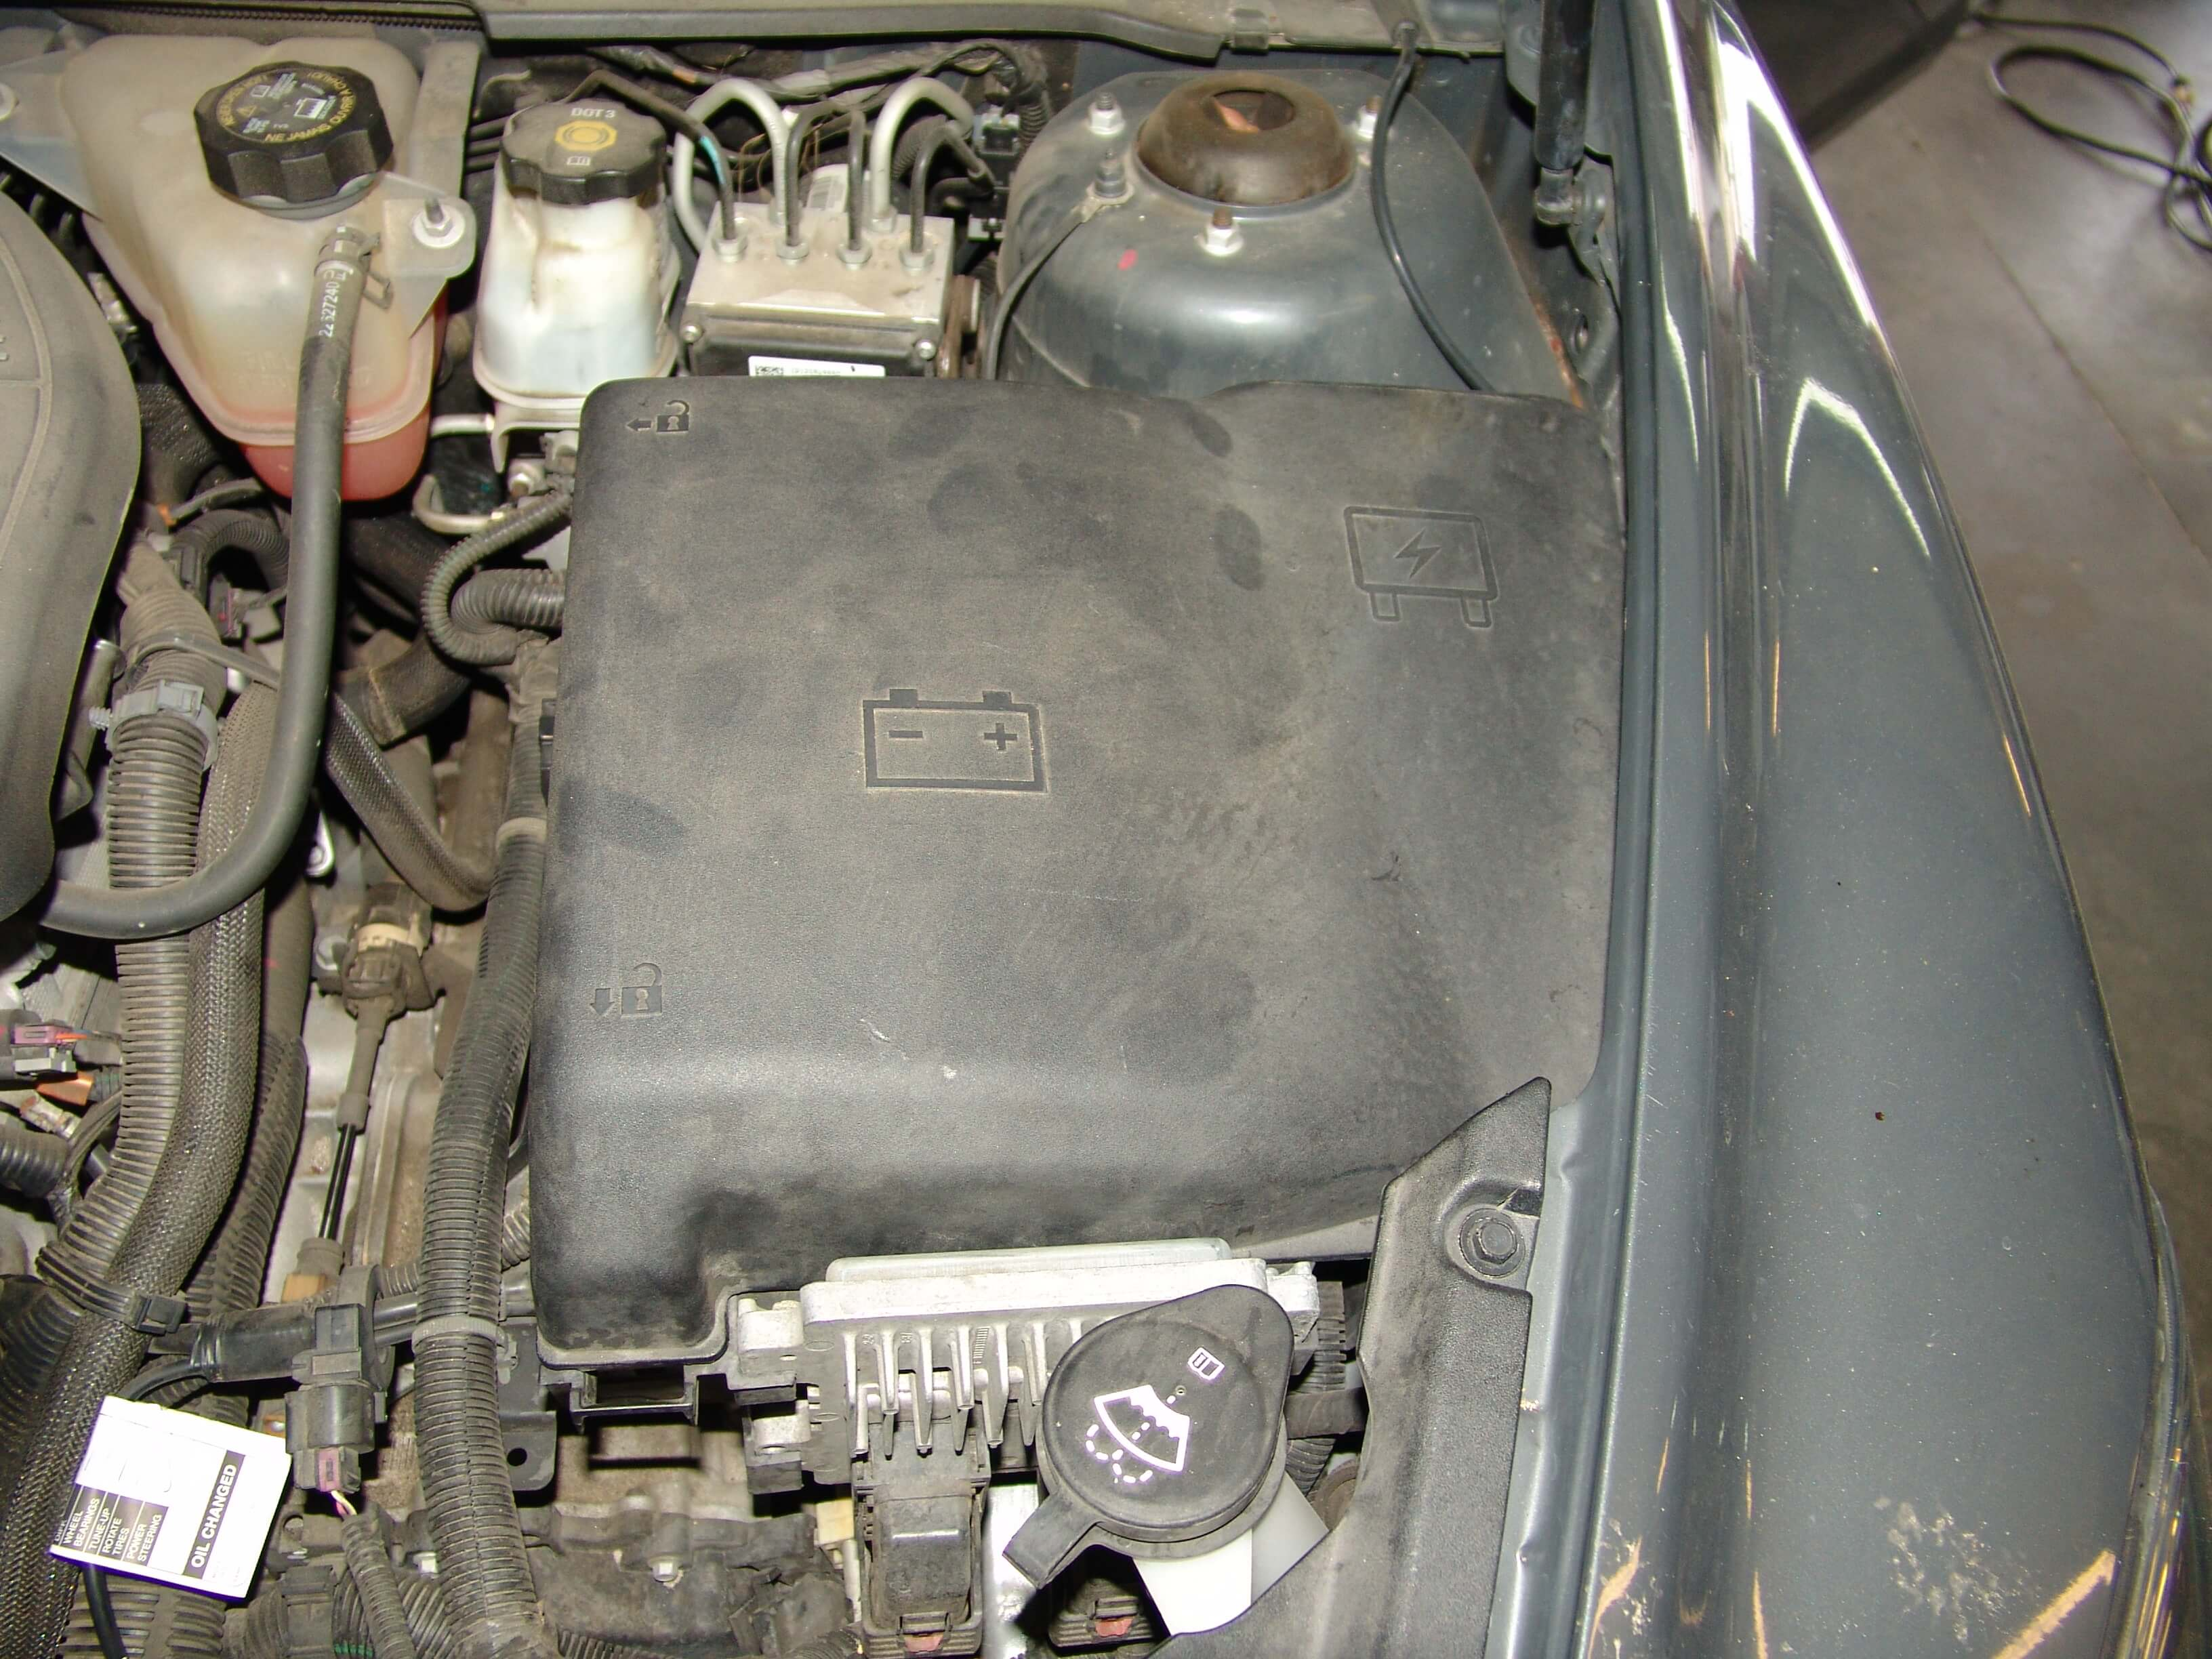 2009 Chevrolet Malibu A  C Controls Inop